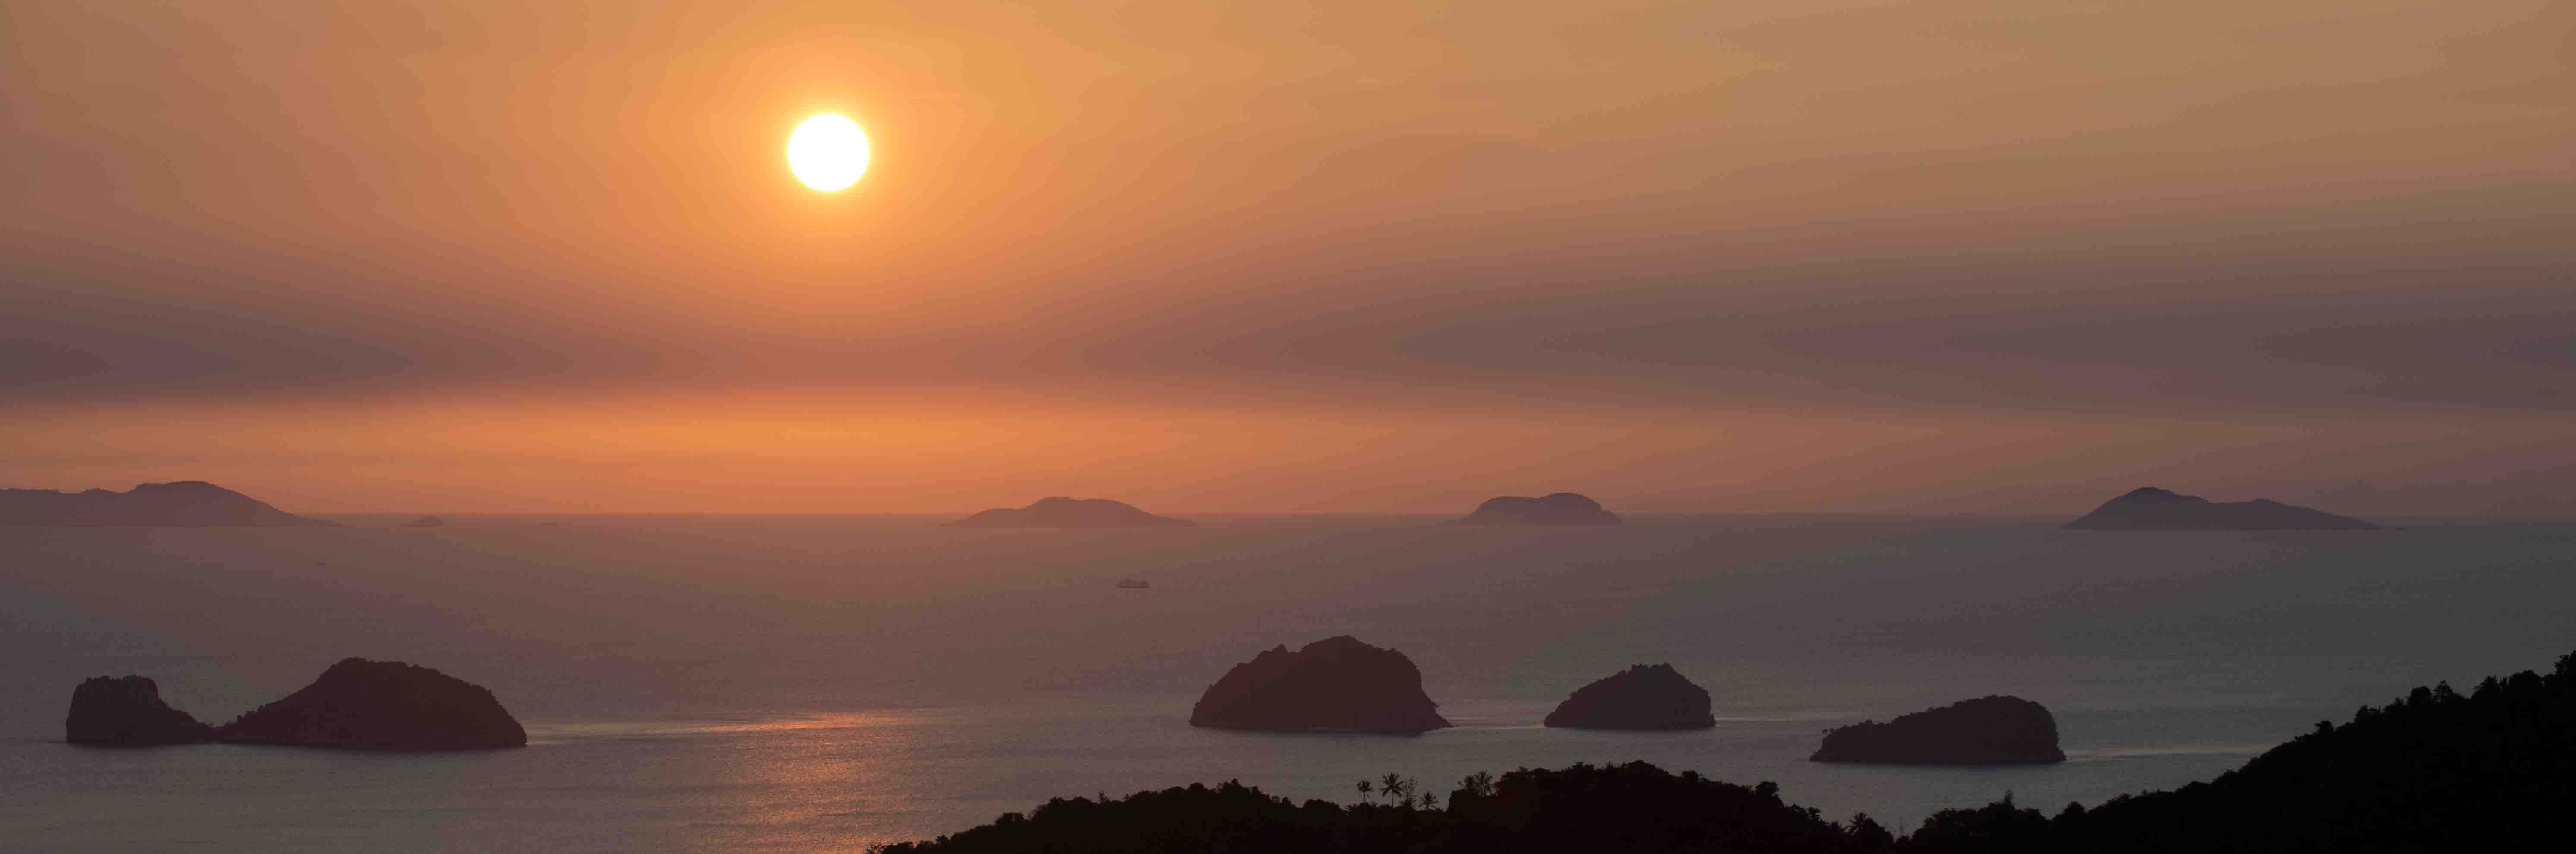 Sunset from Koh Samui